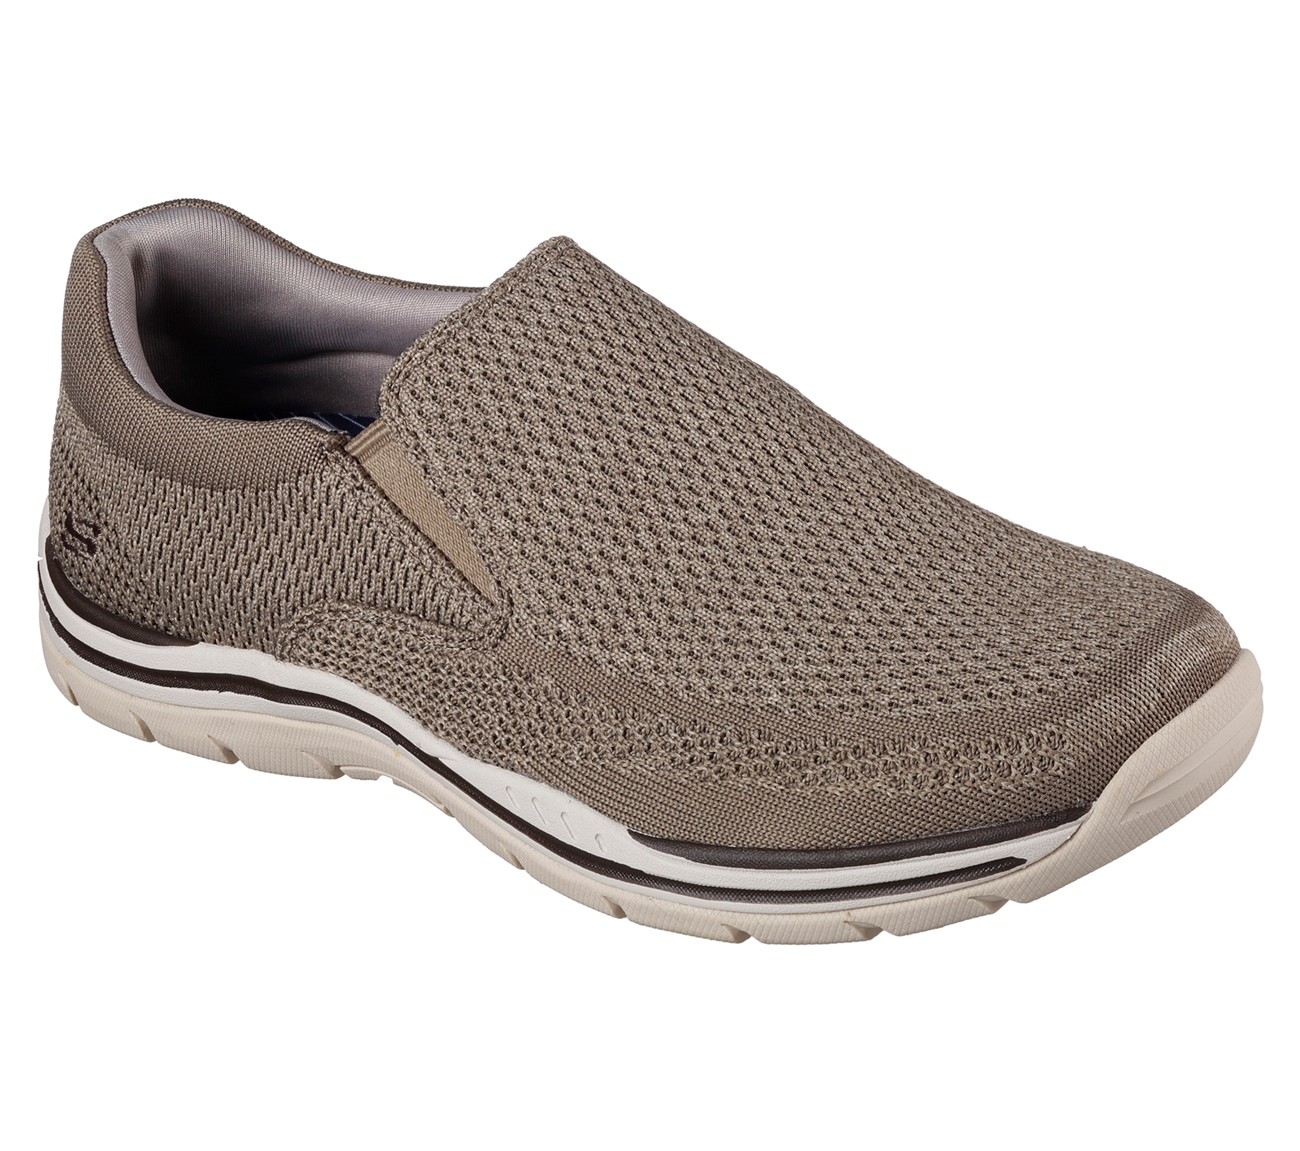 Mens Wide Fit Shoes Size